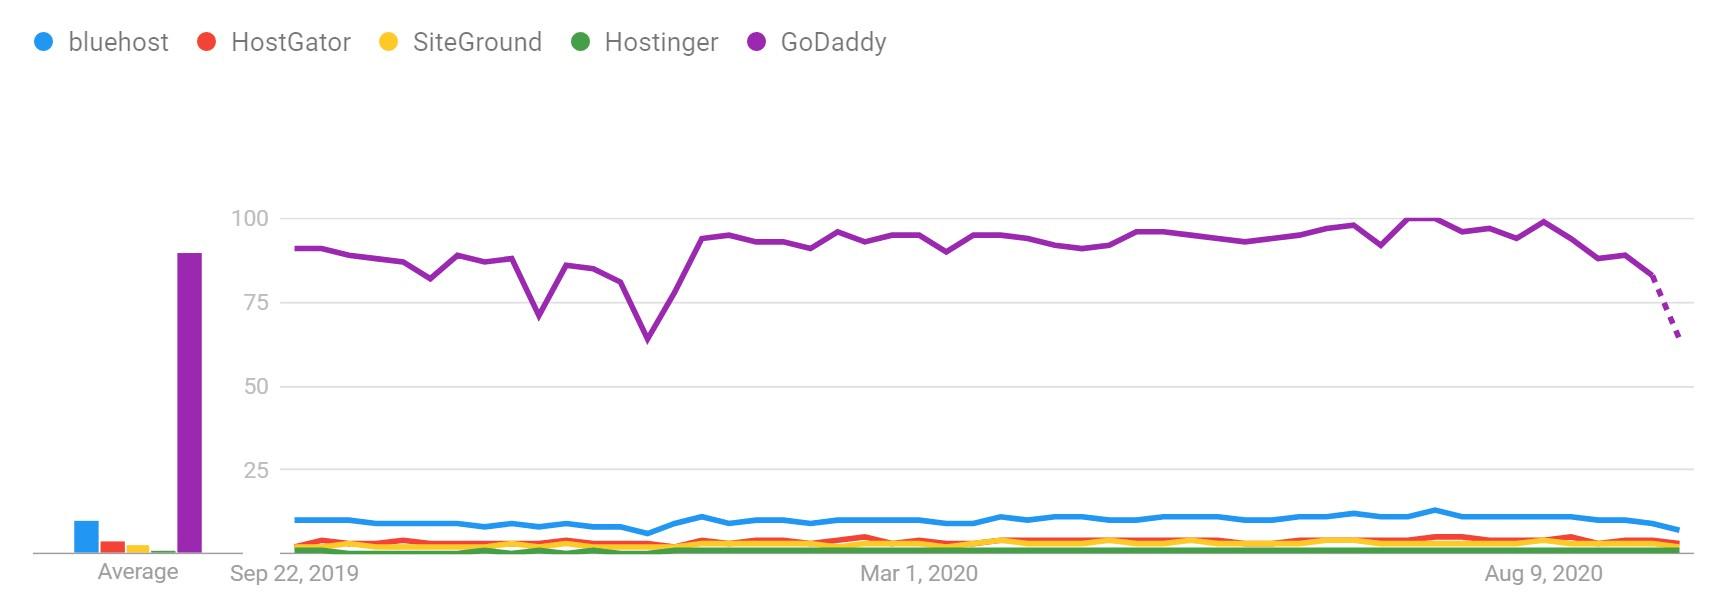 more hosting trends